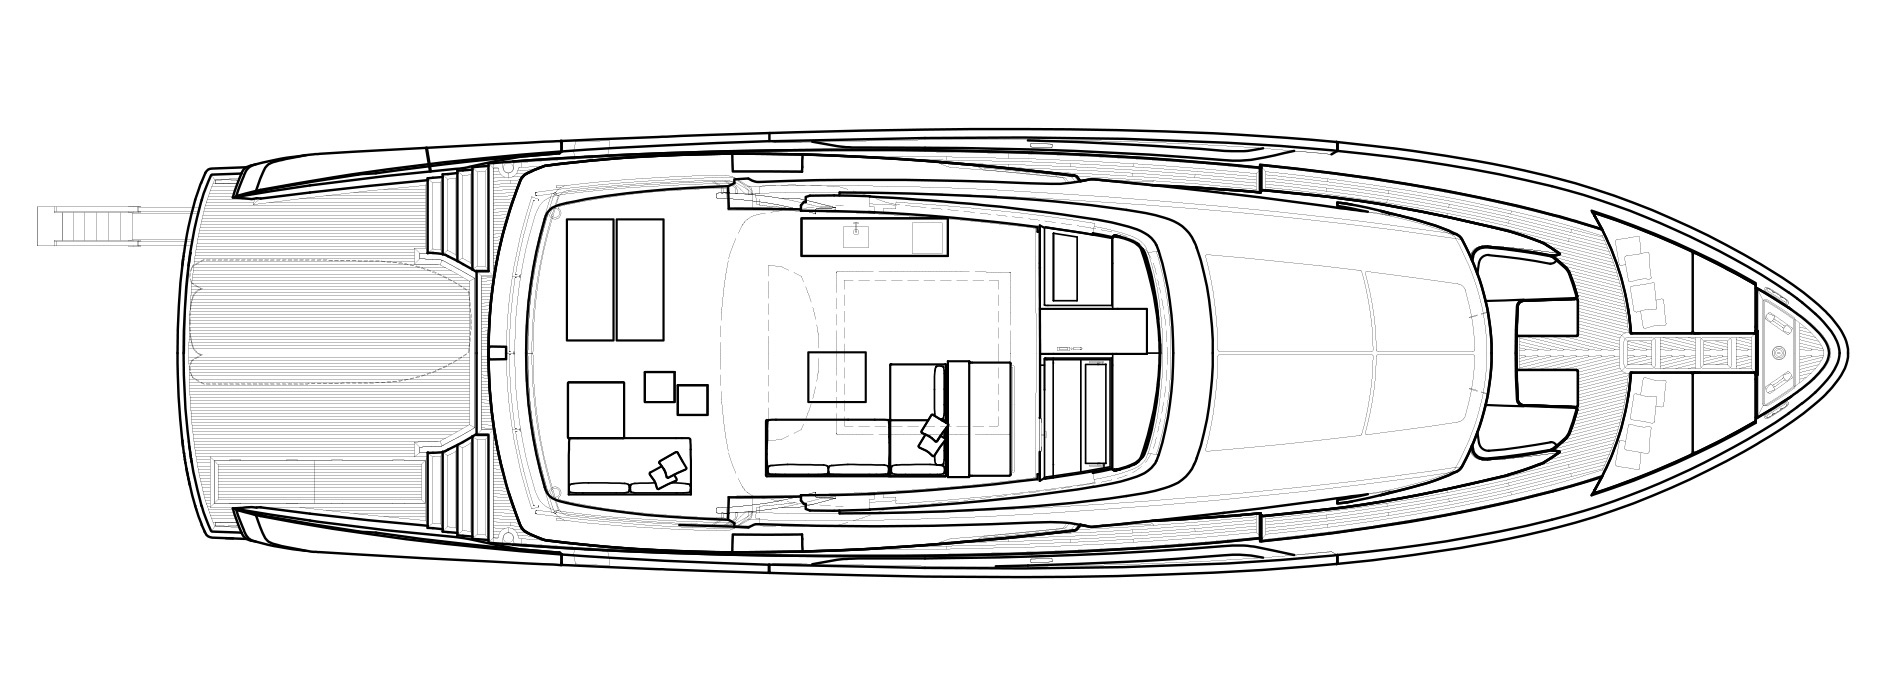 Sanlorenzo Yachts SX88 飞桥 Versione A